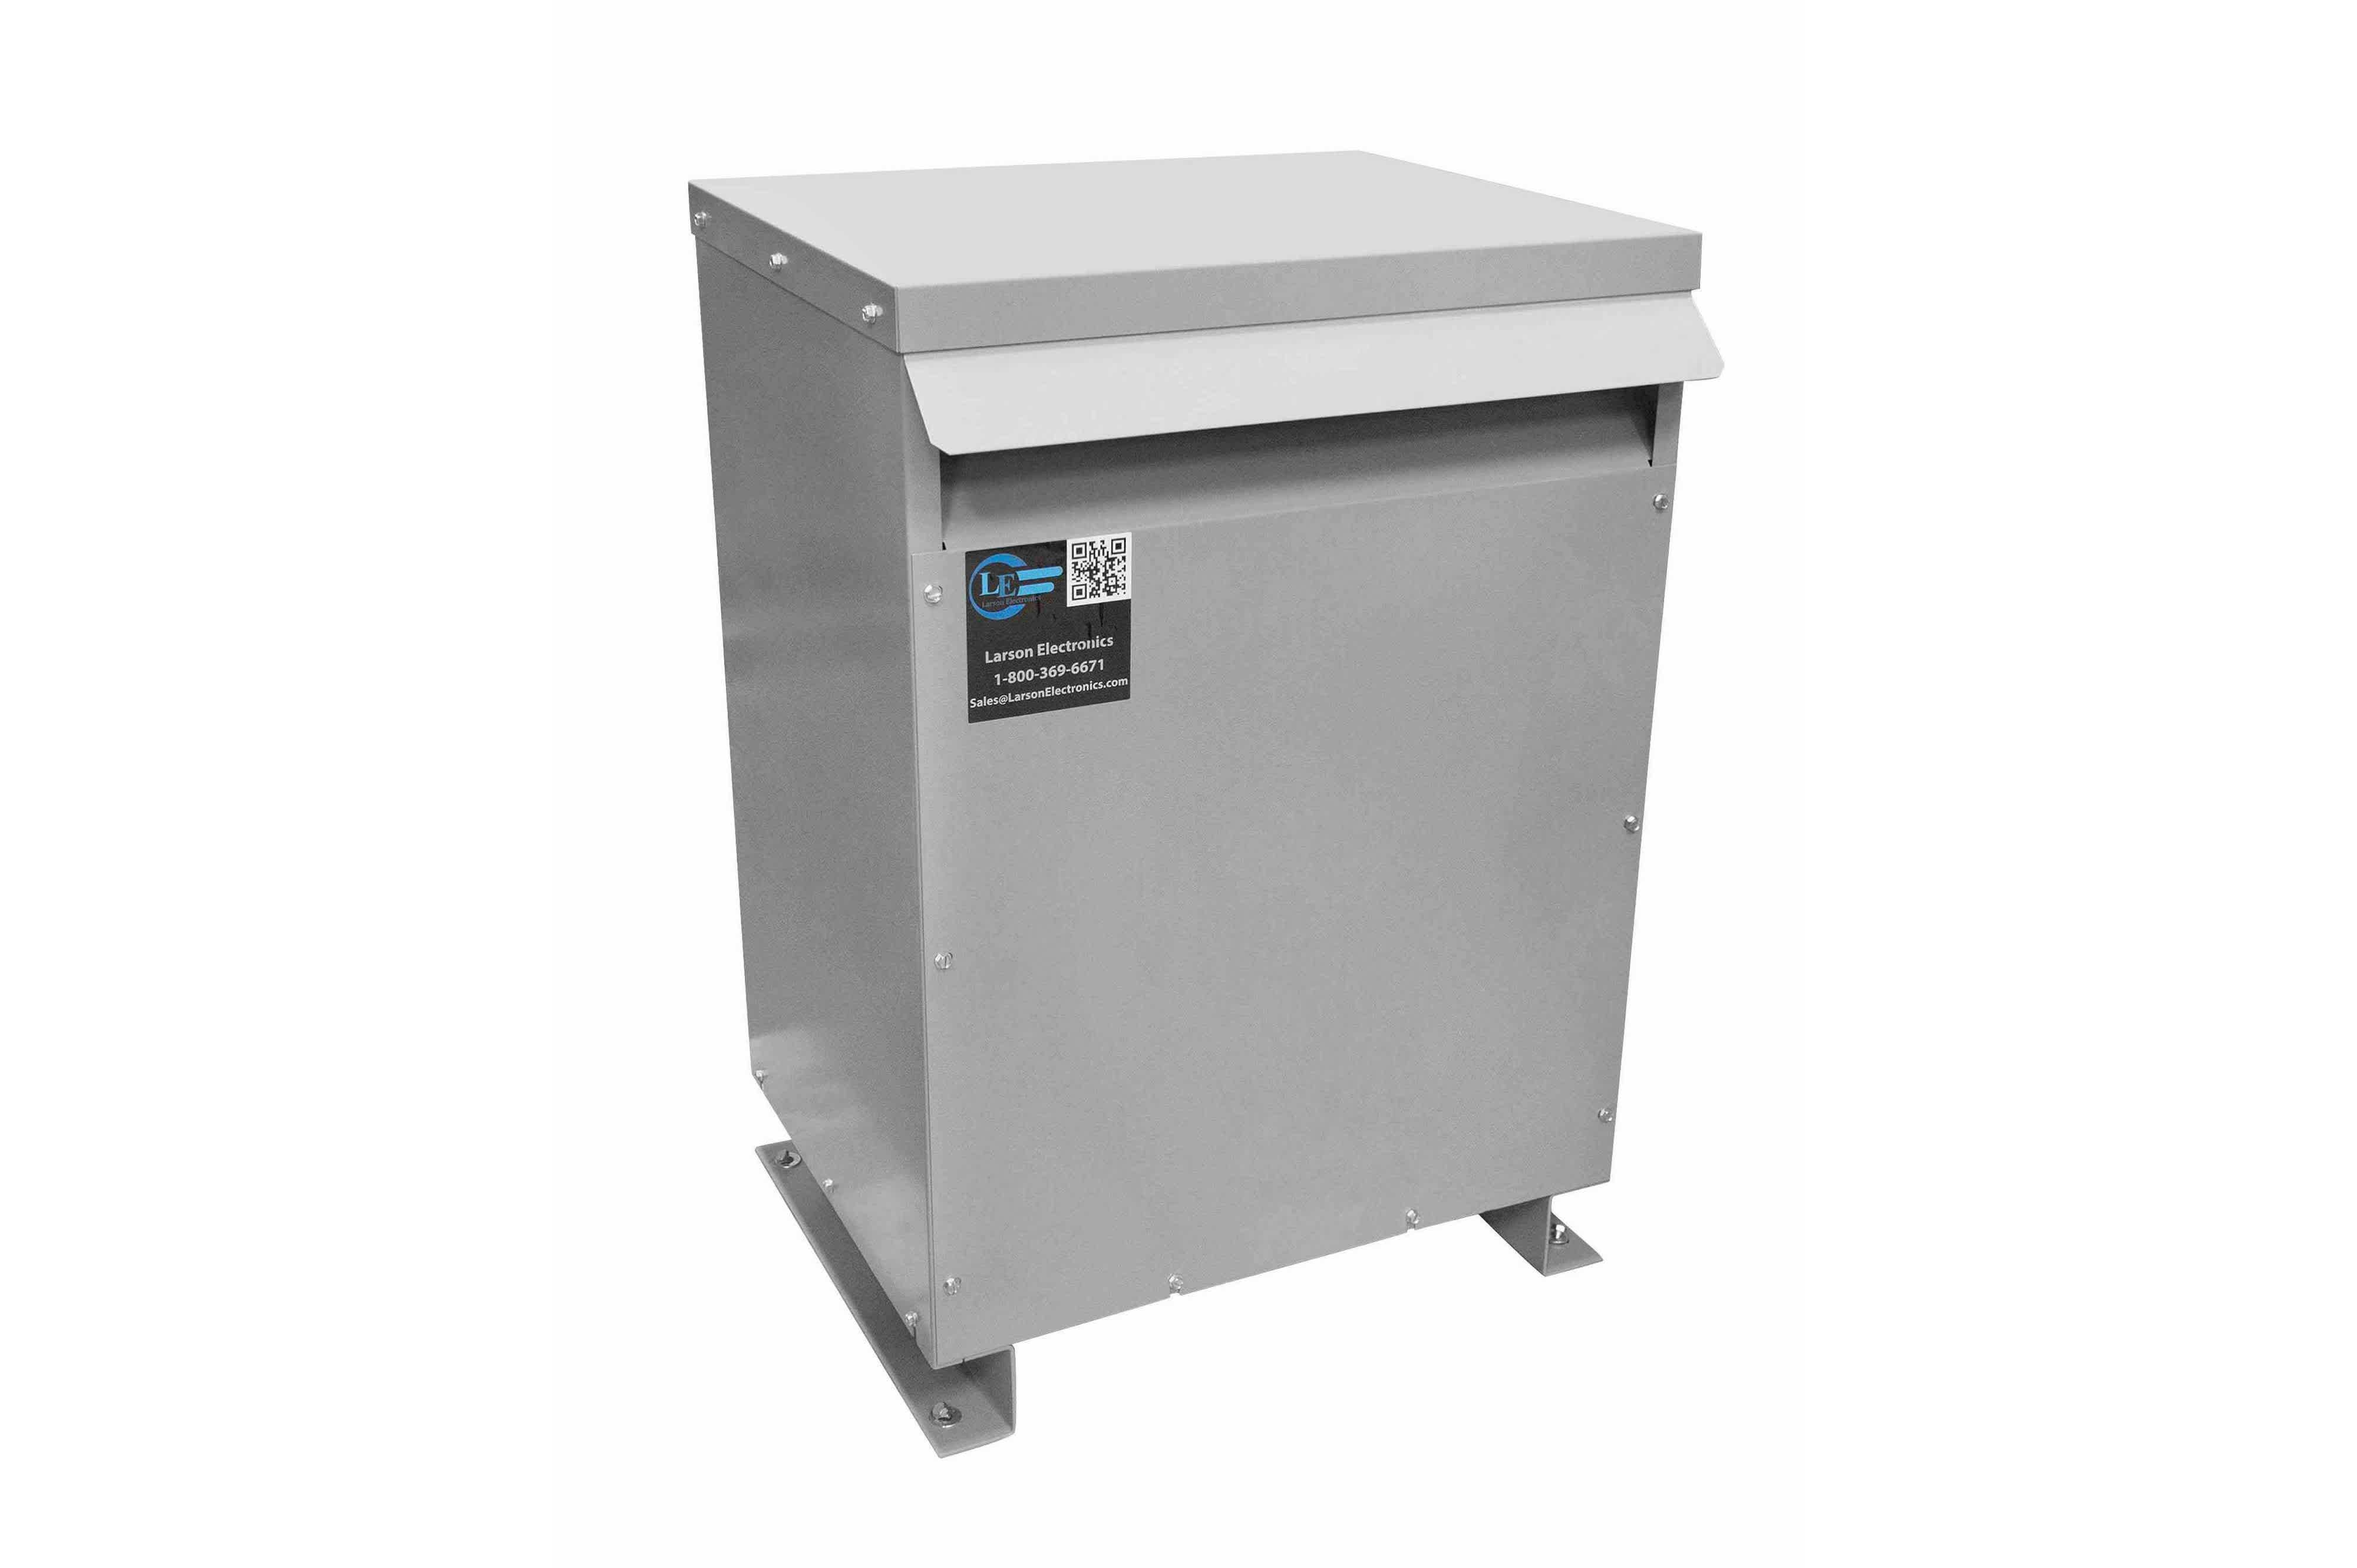 36 kVA 3PH Isolation Transformer, 230V Wye Primary, 208V Delta Secondary, N3R, Ventilated, 60 Hz